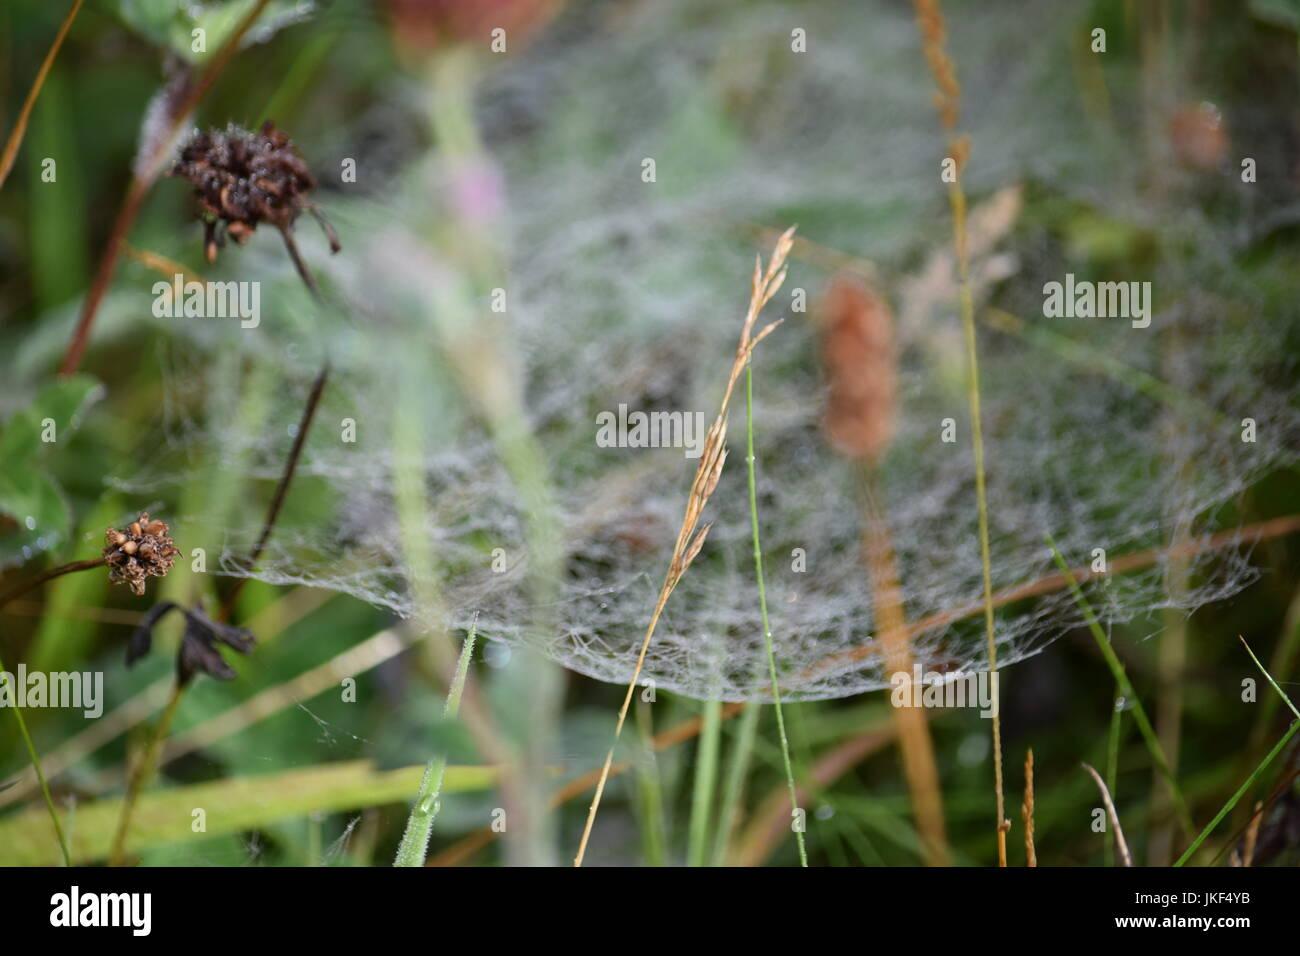 Spider web on scrub land - Stock Image